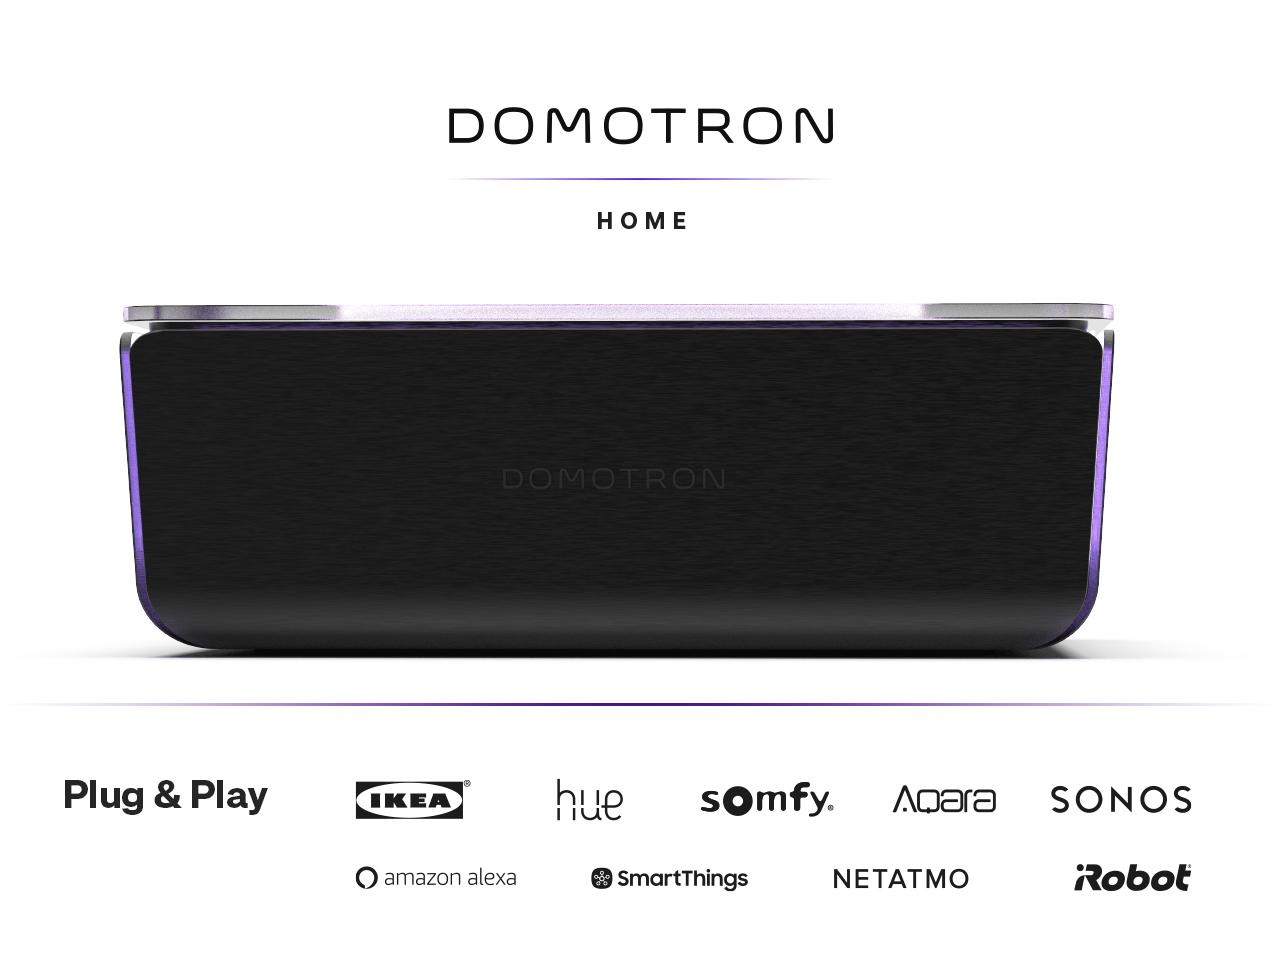 Domotron Home